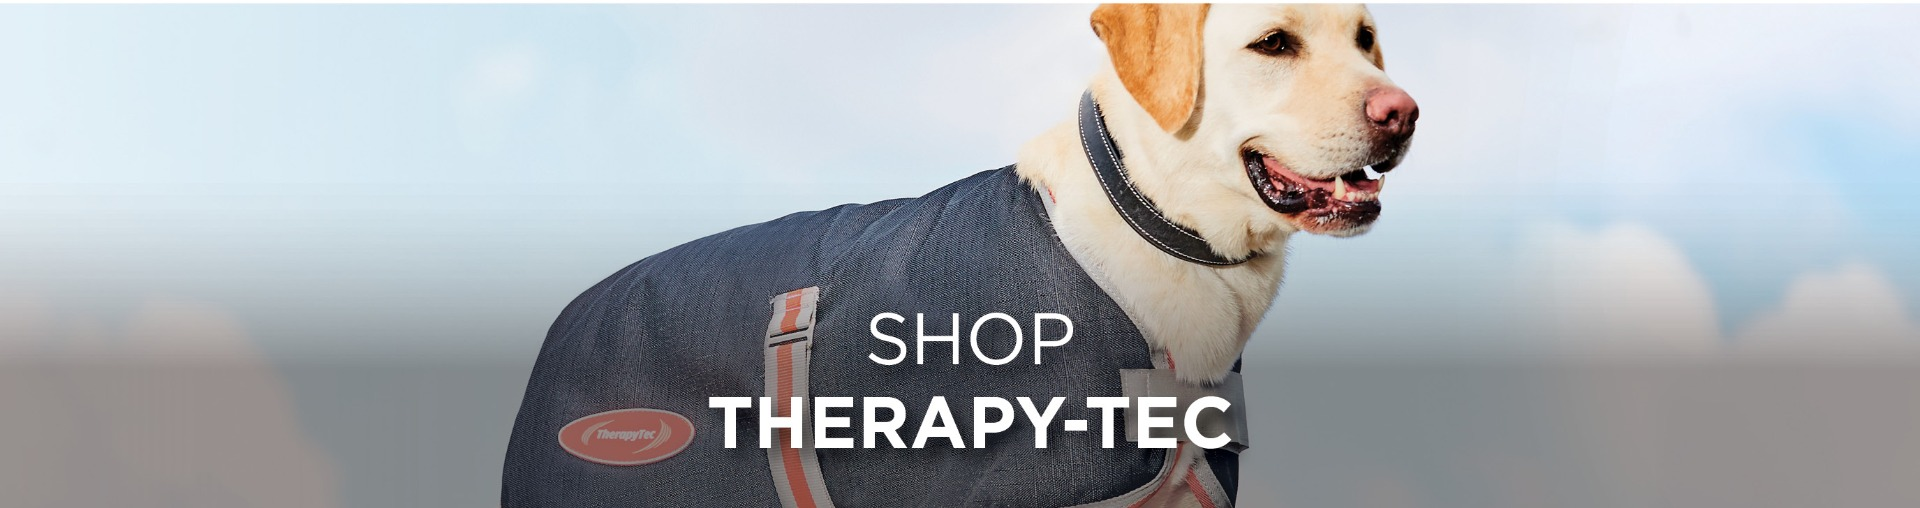 WeatherBeeta Dog Accessories